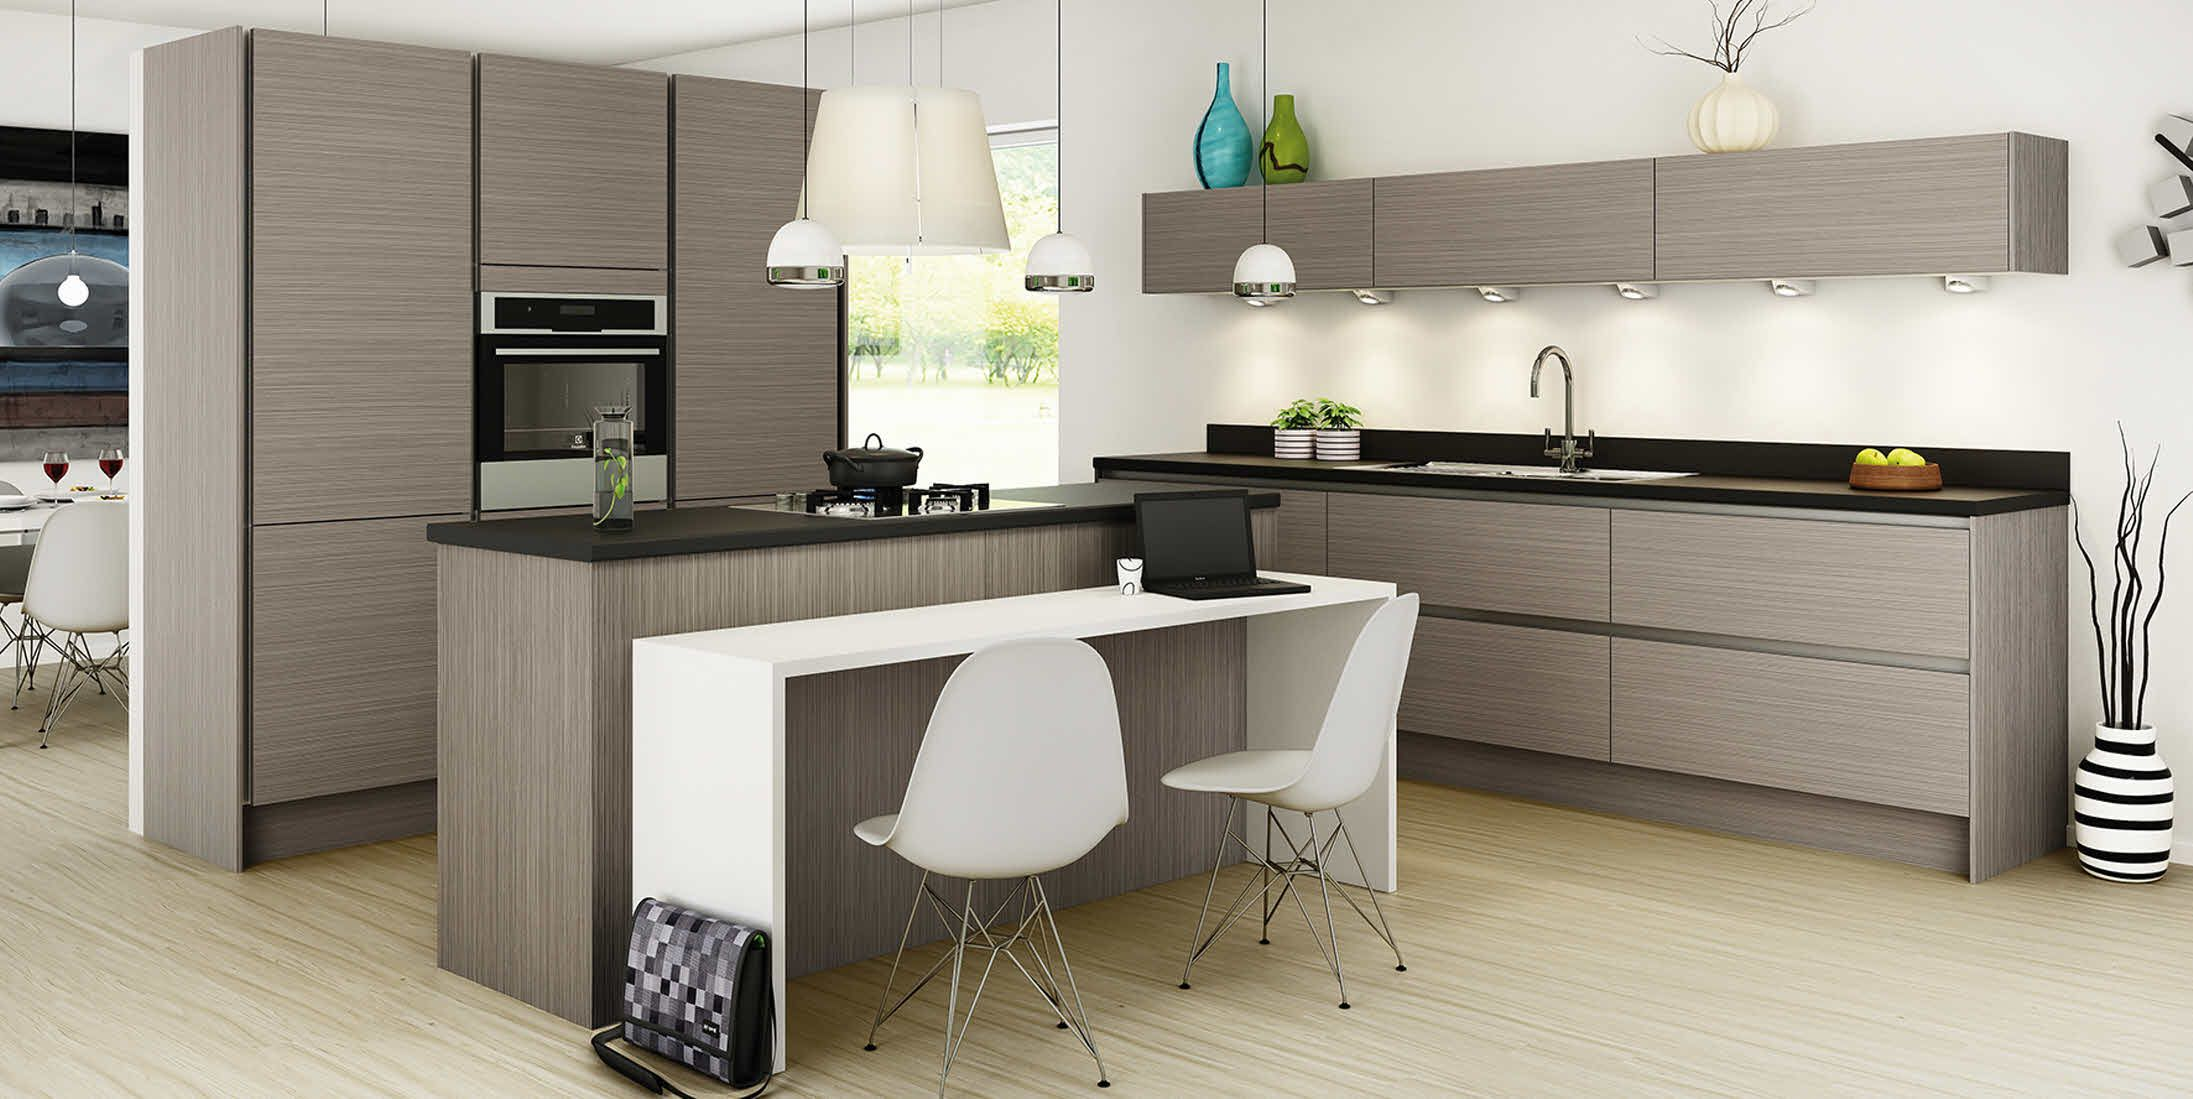 Integra Fantasy Grey kitchen units. 50 off all